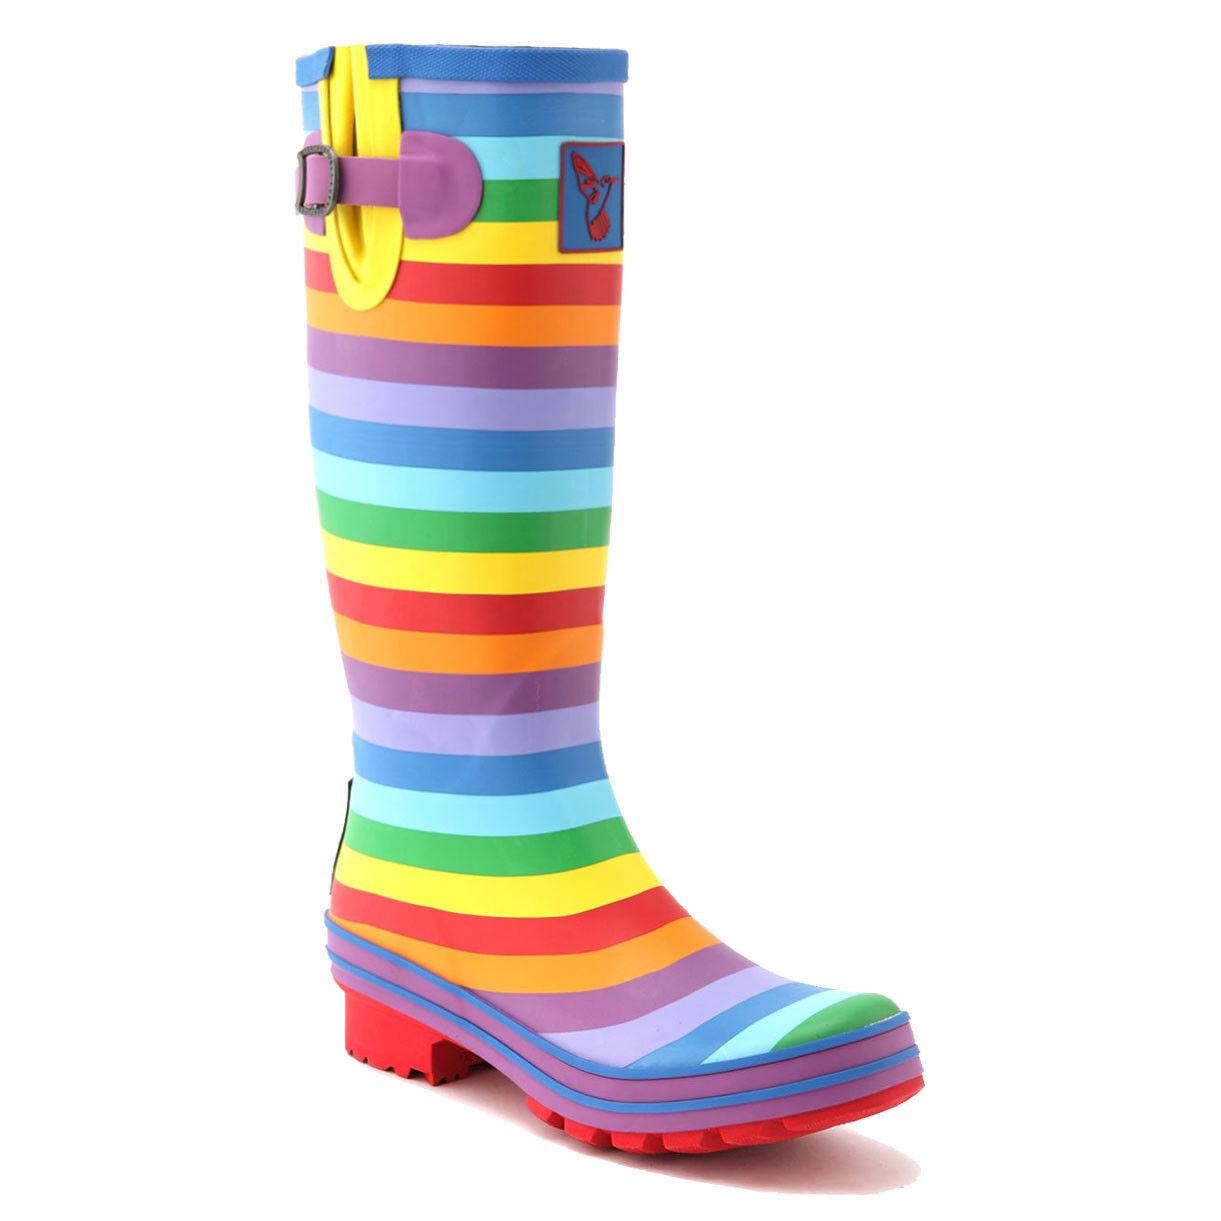 Women's High Quality Rainbow Rain Boot Knee-High Waterproof boots UK Brand